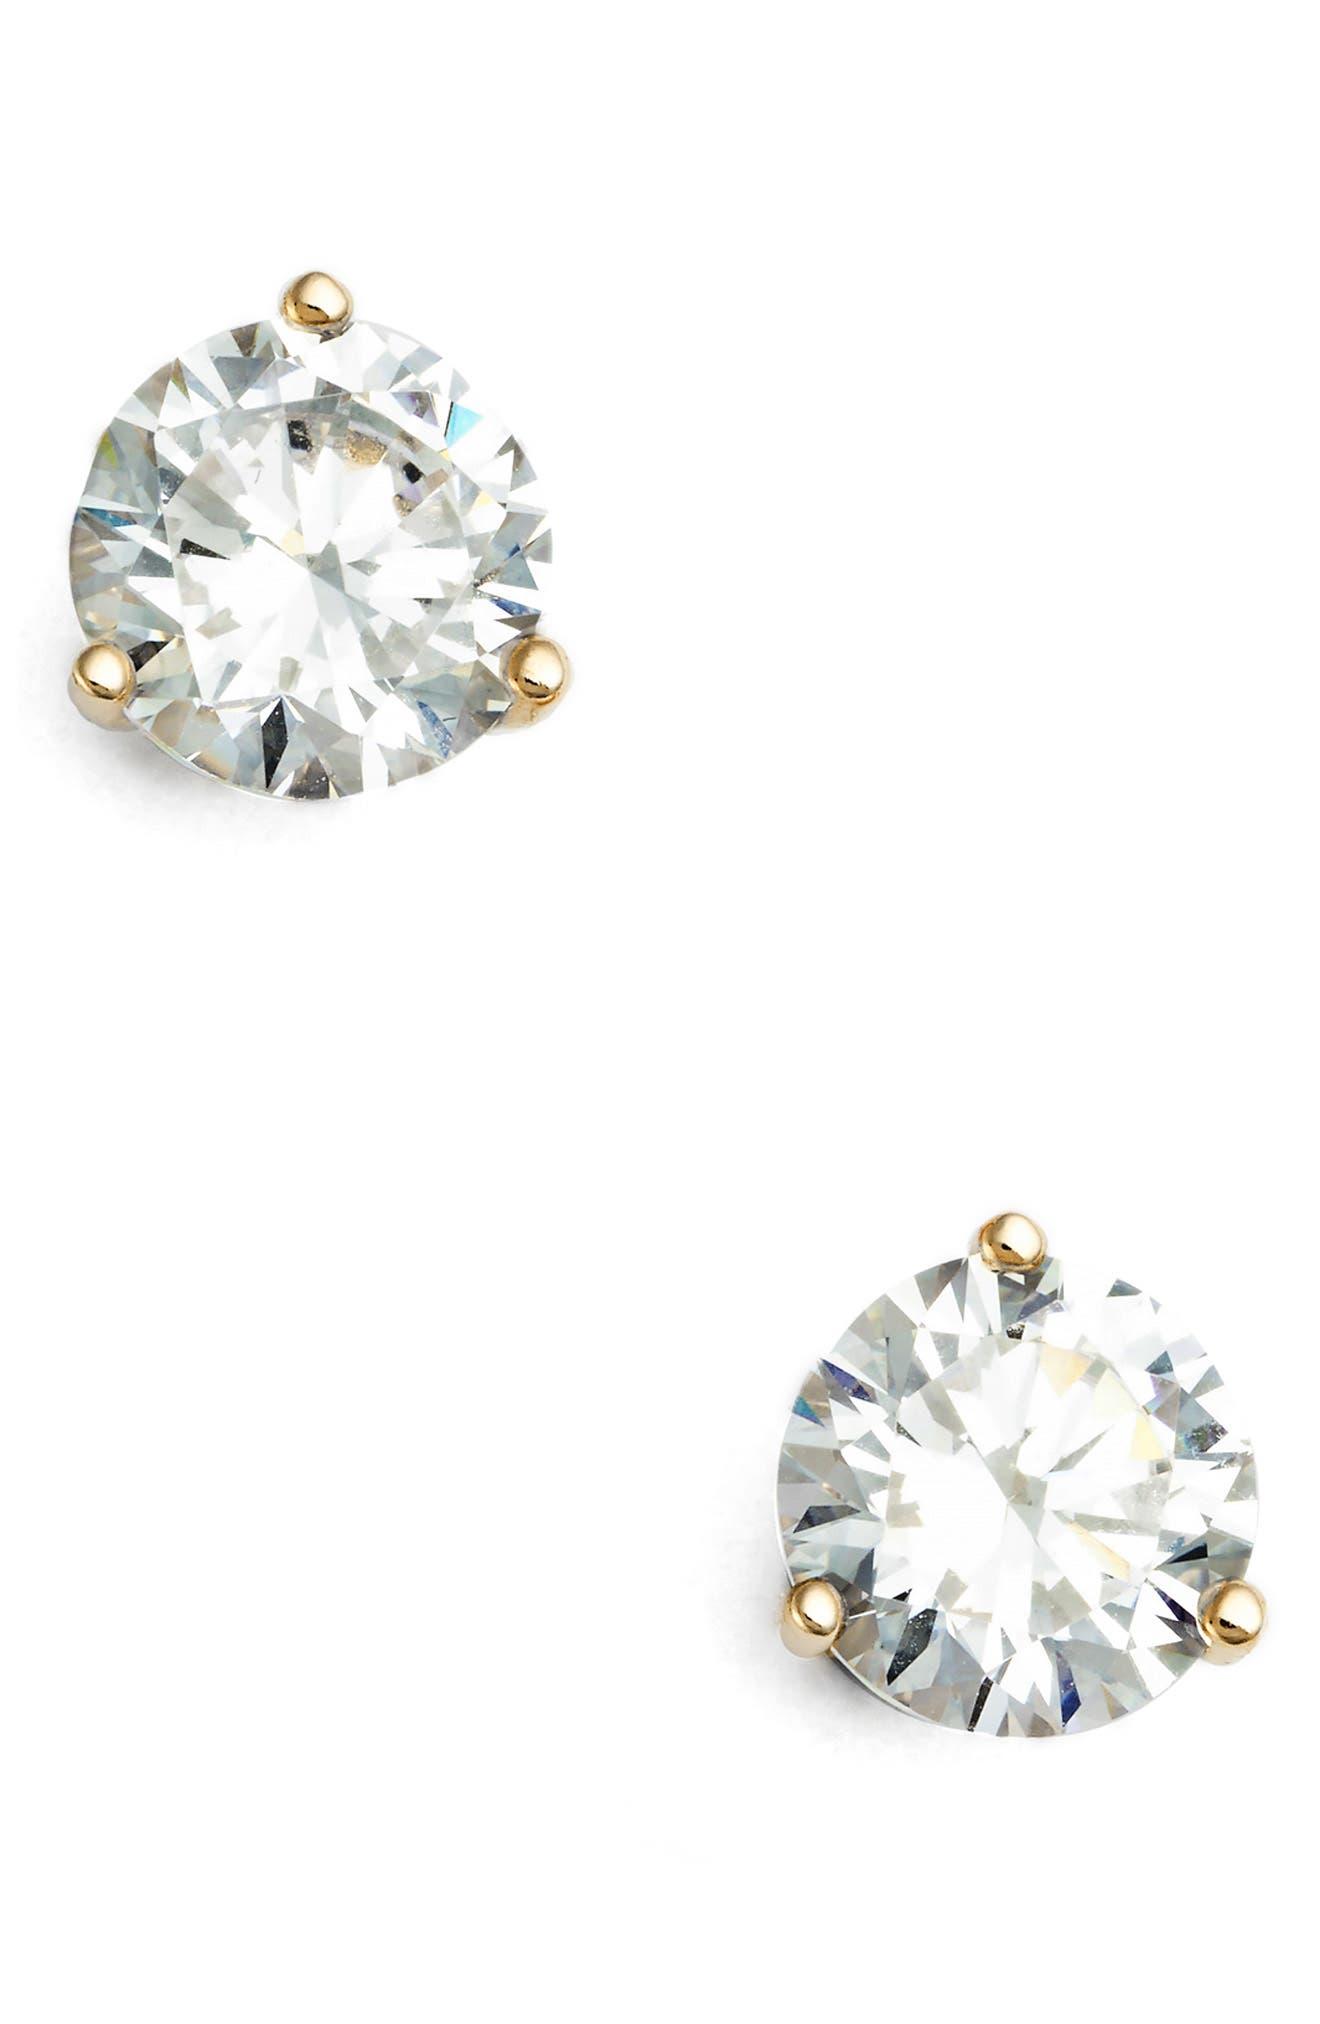 Alternate Image 1 Selected - Nordstrom Precious Metal Plated 2ct tw Cubic Zirconia Earrings